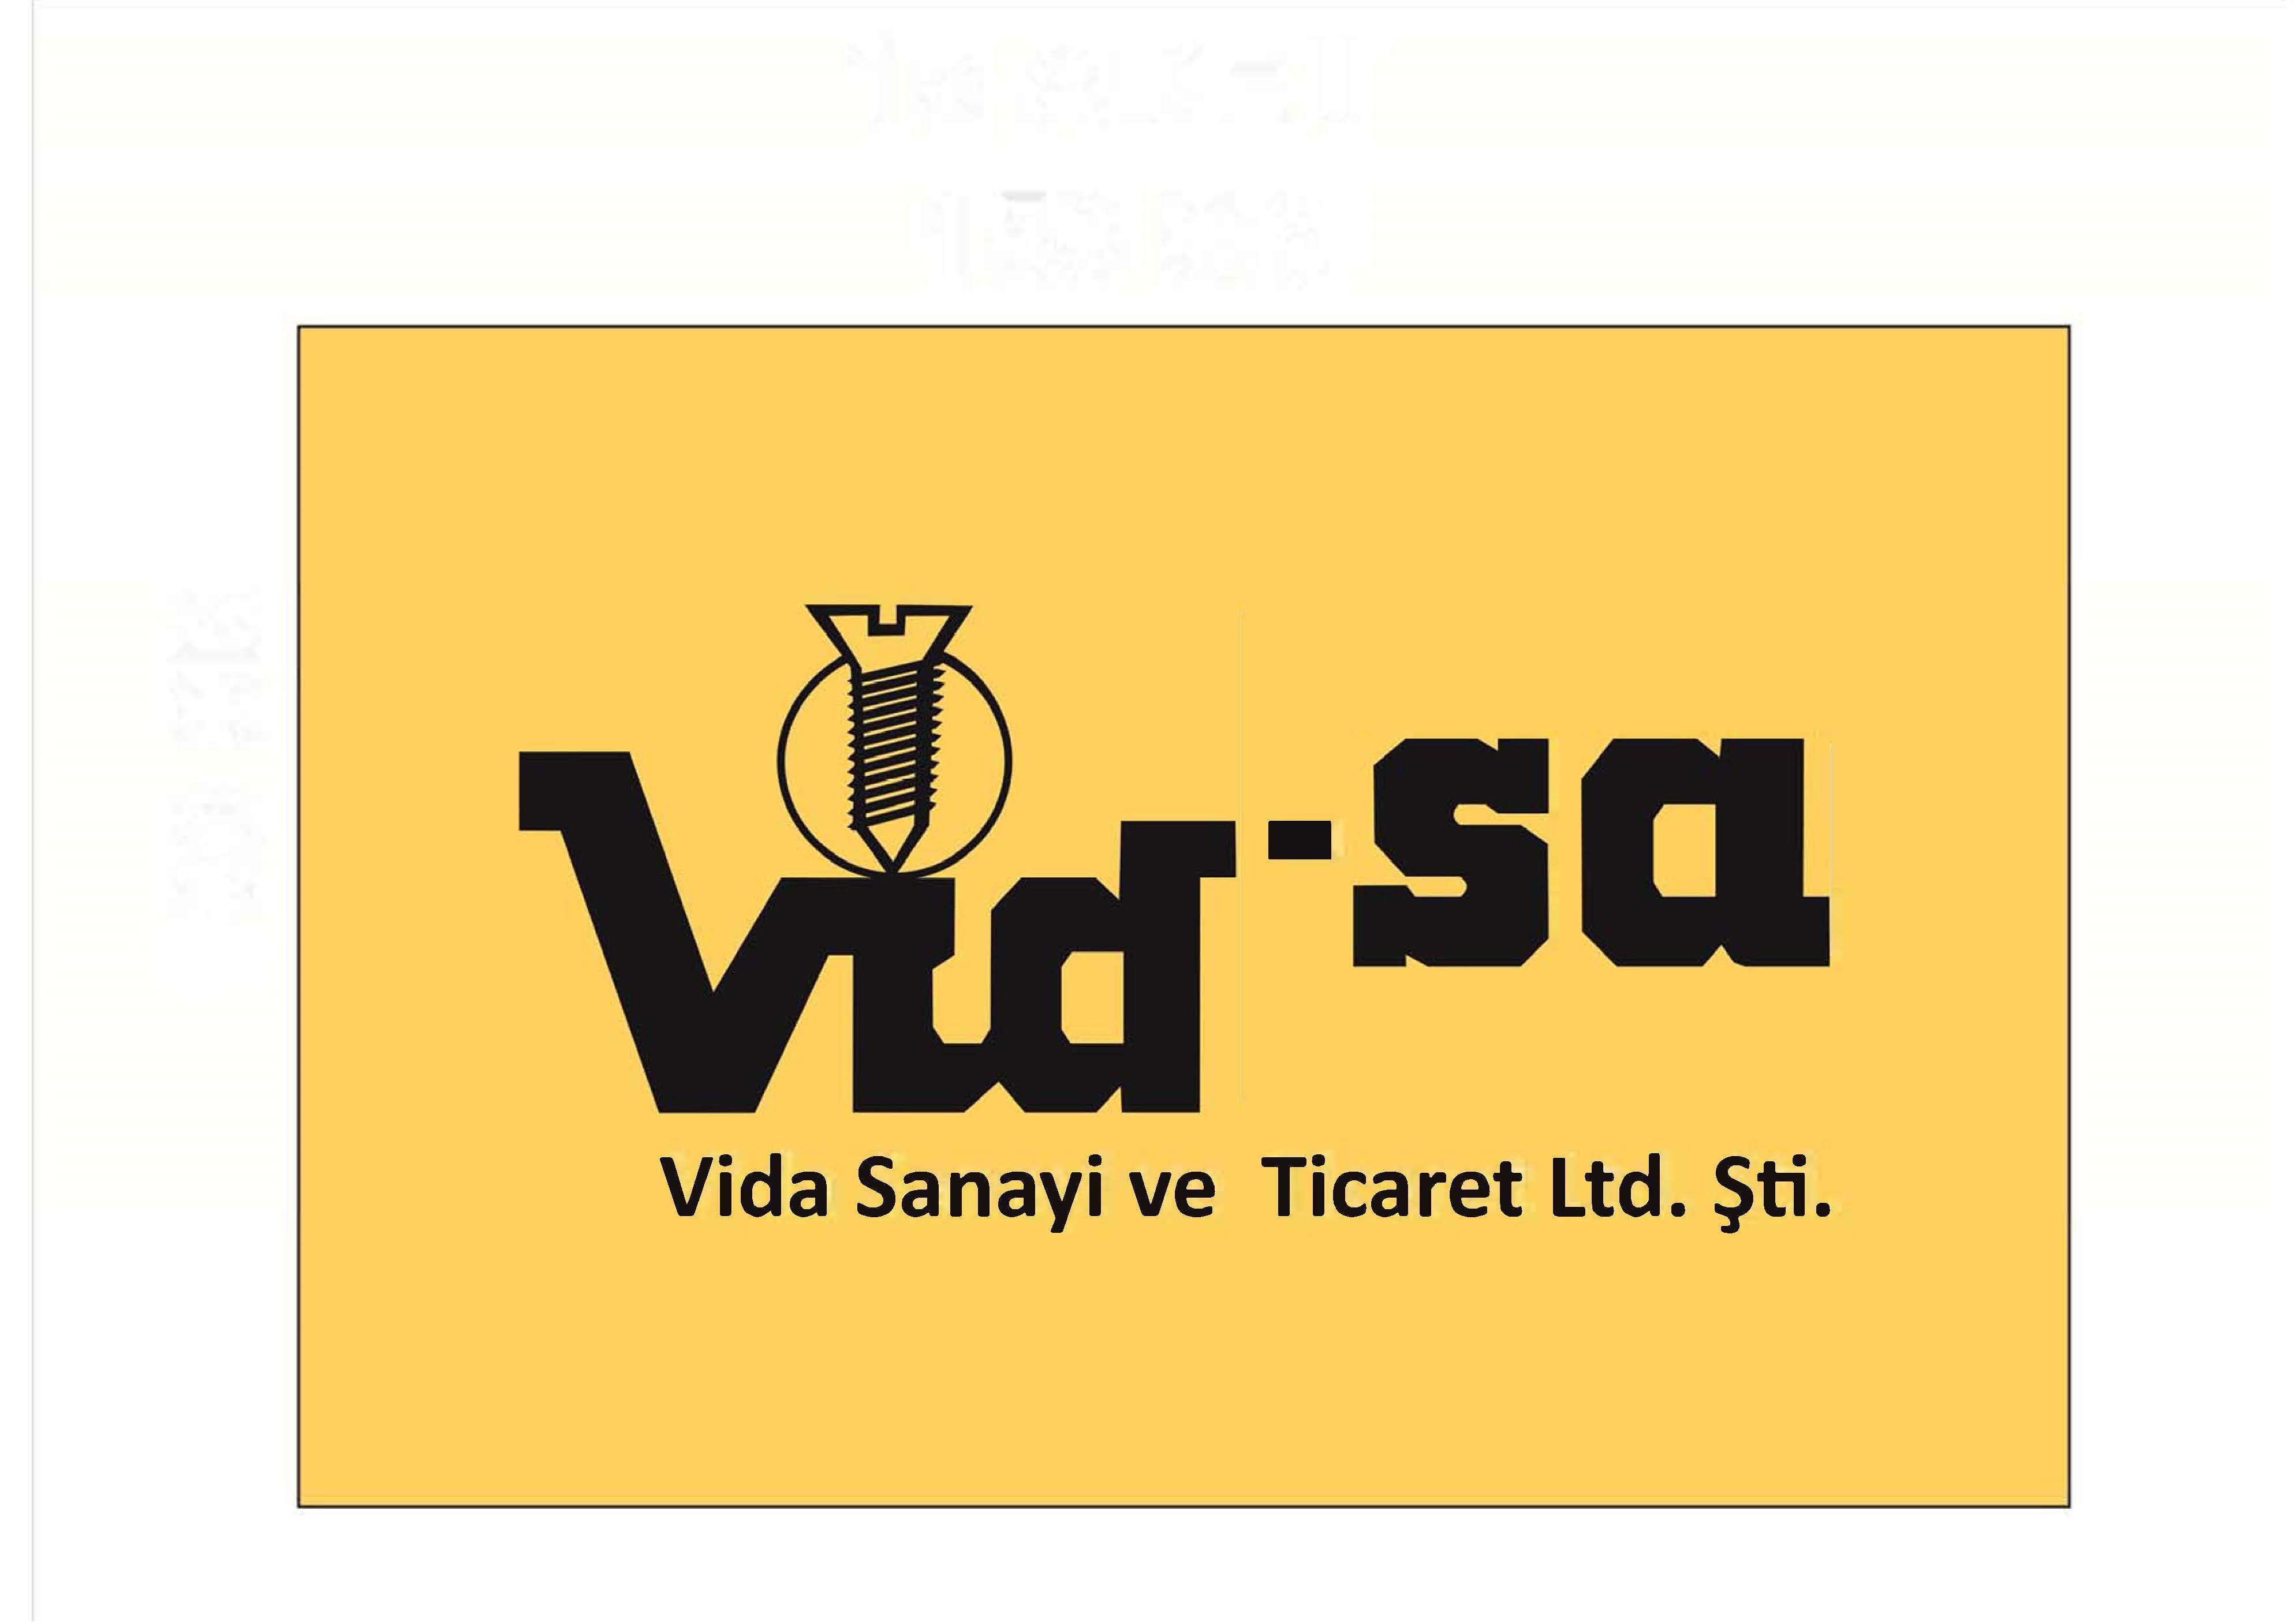 Vid-sa Vida Sanayi ve Ticaret Ltd Şti., VID-SA FASTENERS Ltd.